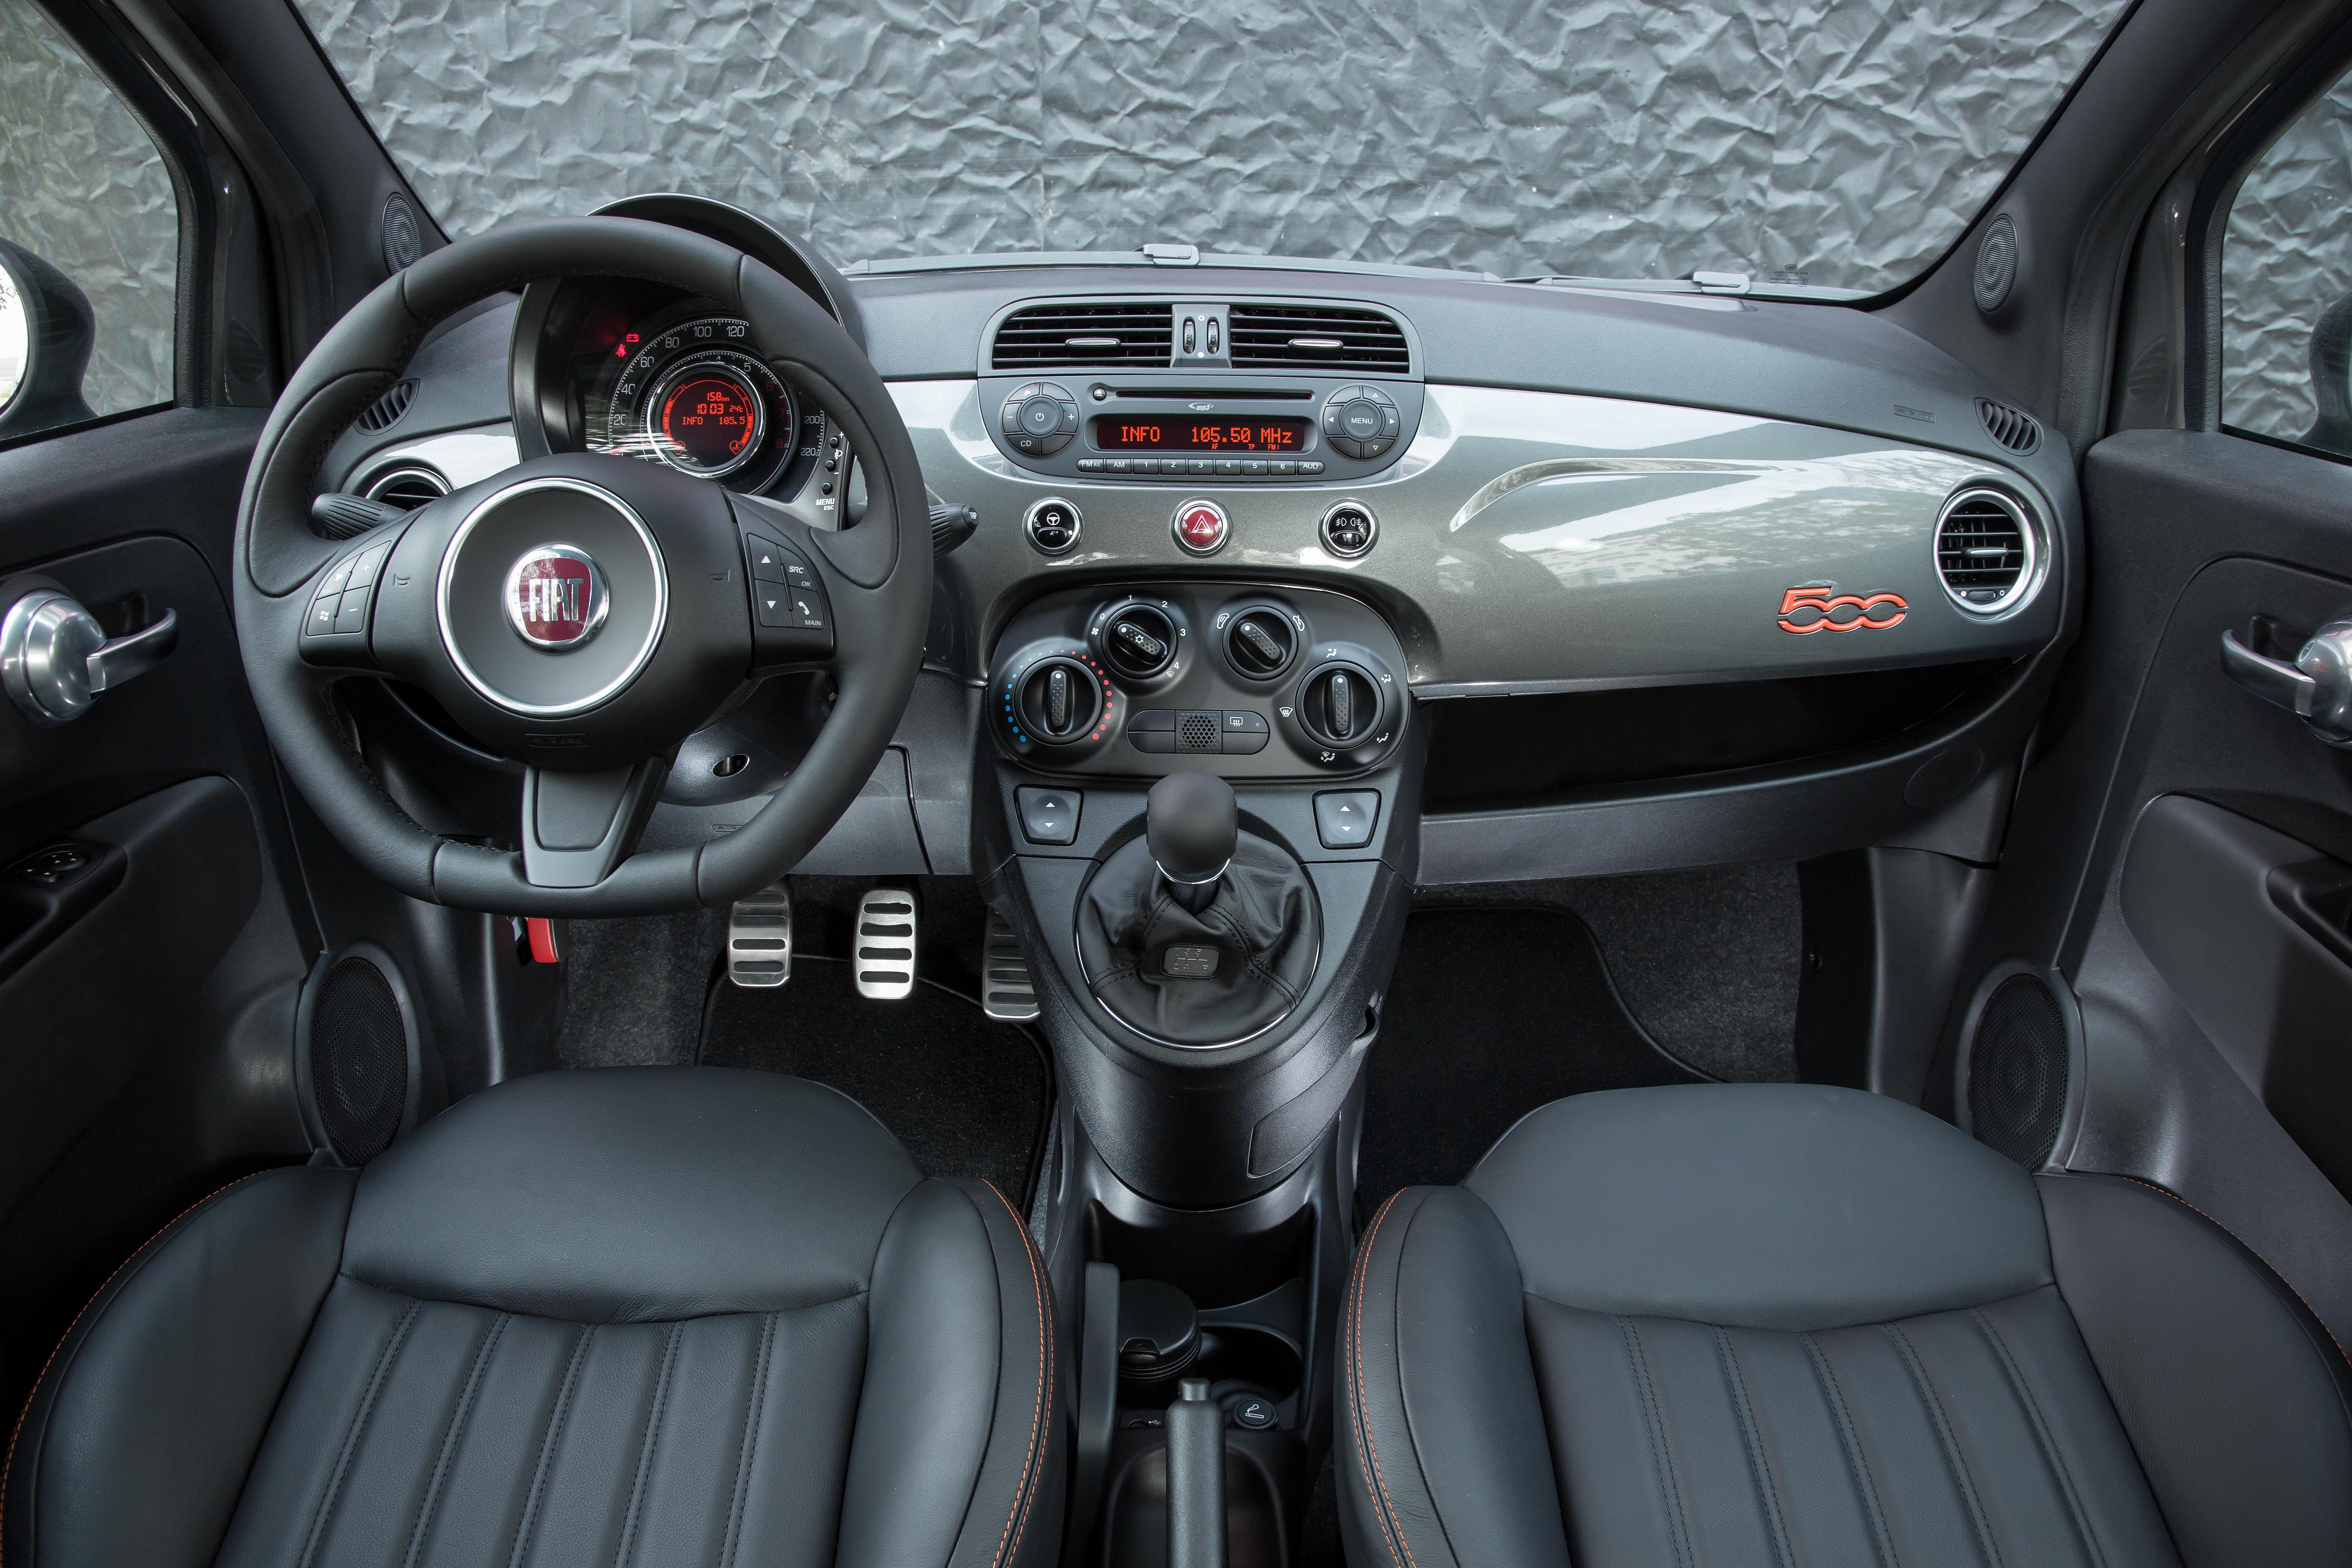 Fiat 500 Gq La 171 Gentlemen Car 187 Communiqu 233 S De Presse